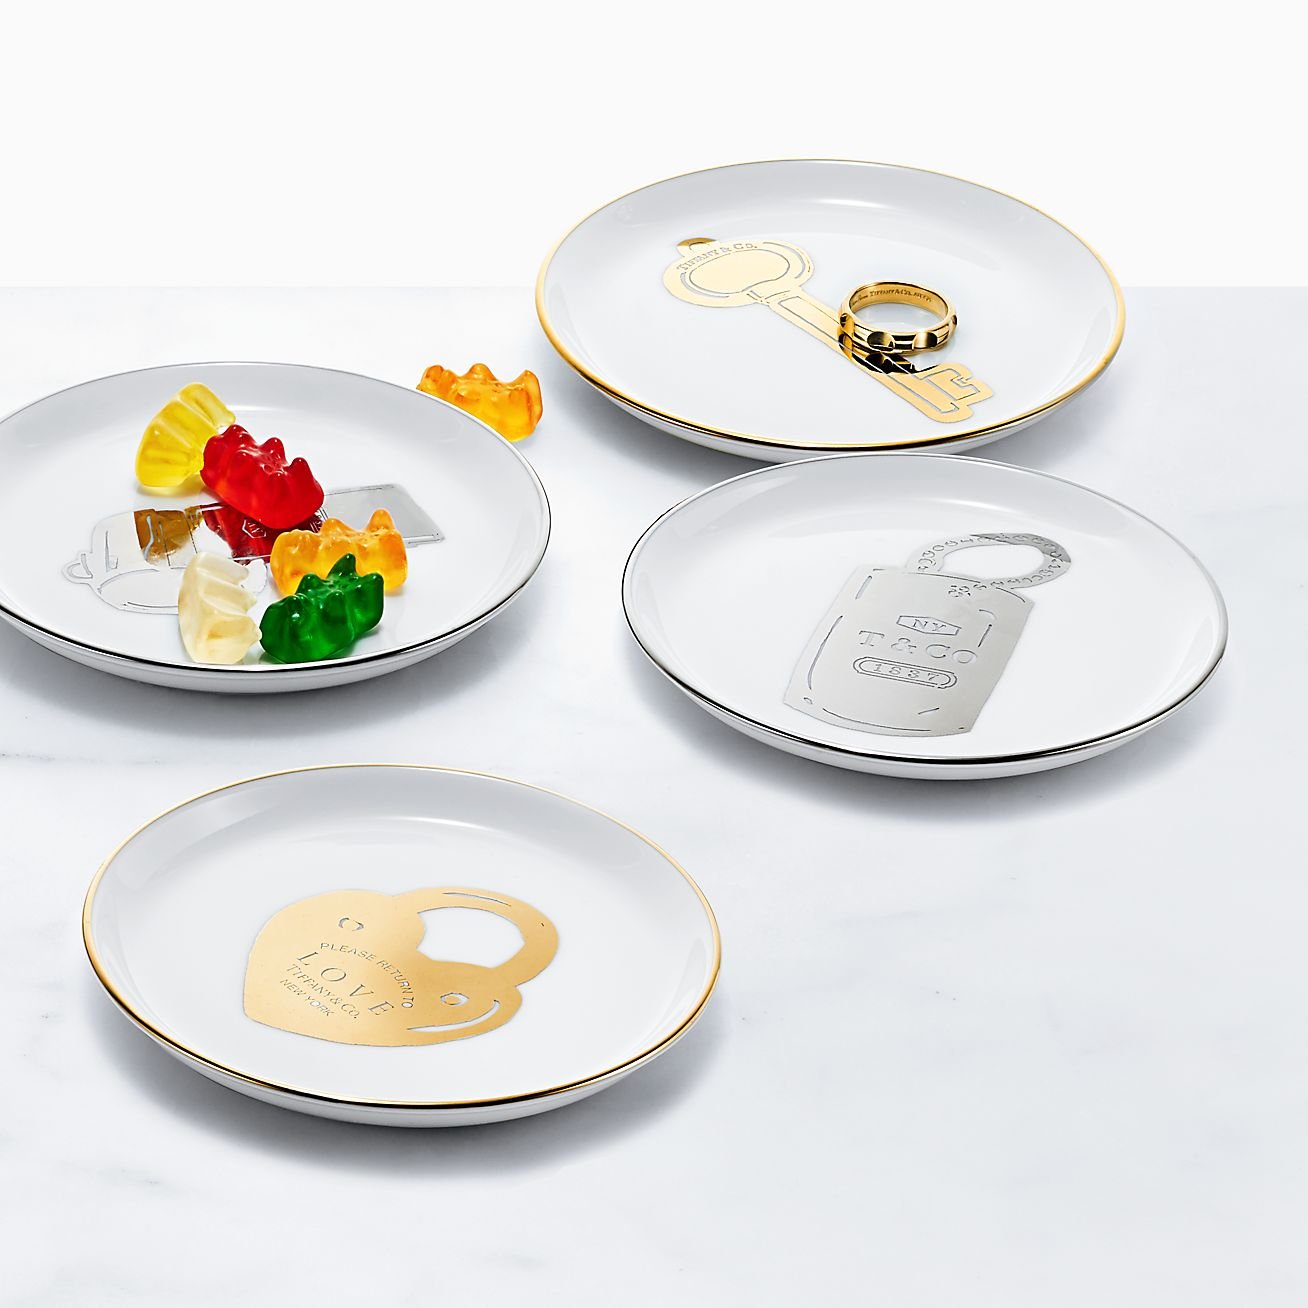 delete_large Round Ring Dish Set Round Ring Dish Set_alternative-view-1  sc 1 st  Tiffany & Round ring dishes in porcelain set of four. | Tiffany \u0026 Co.